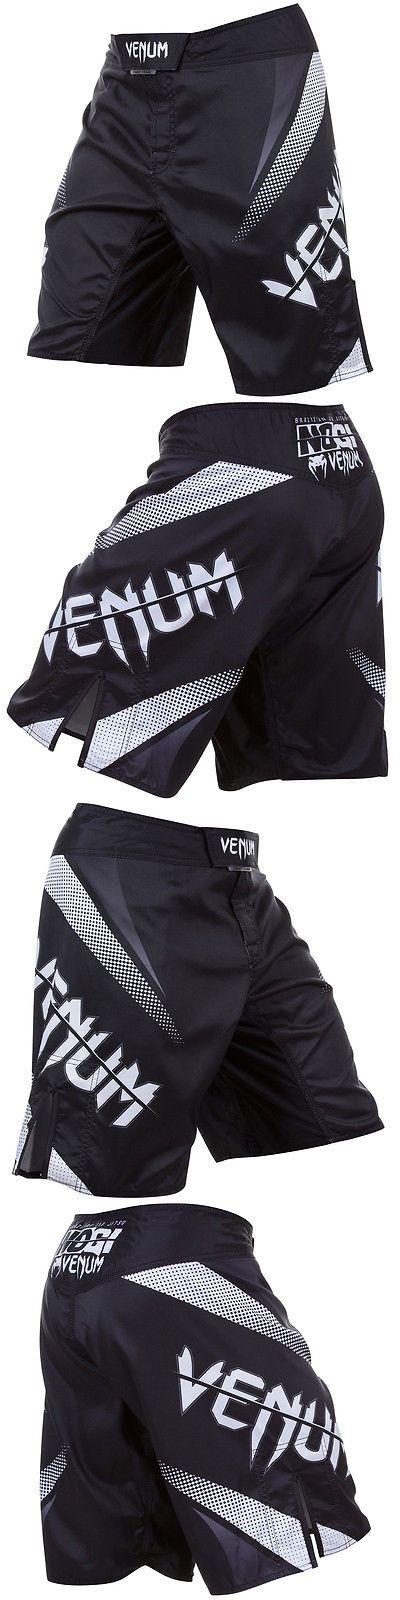 Shorts 73982: Venum No-Gi 4-Way Stretch Mma Fight Shorts - Small - Black -> BUY IT NOW ONLY: $67.99 on eBay!